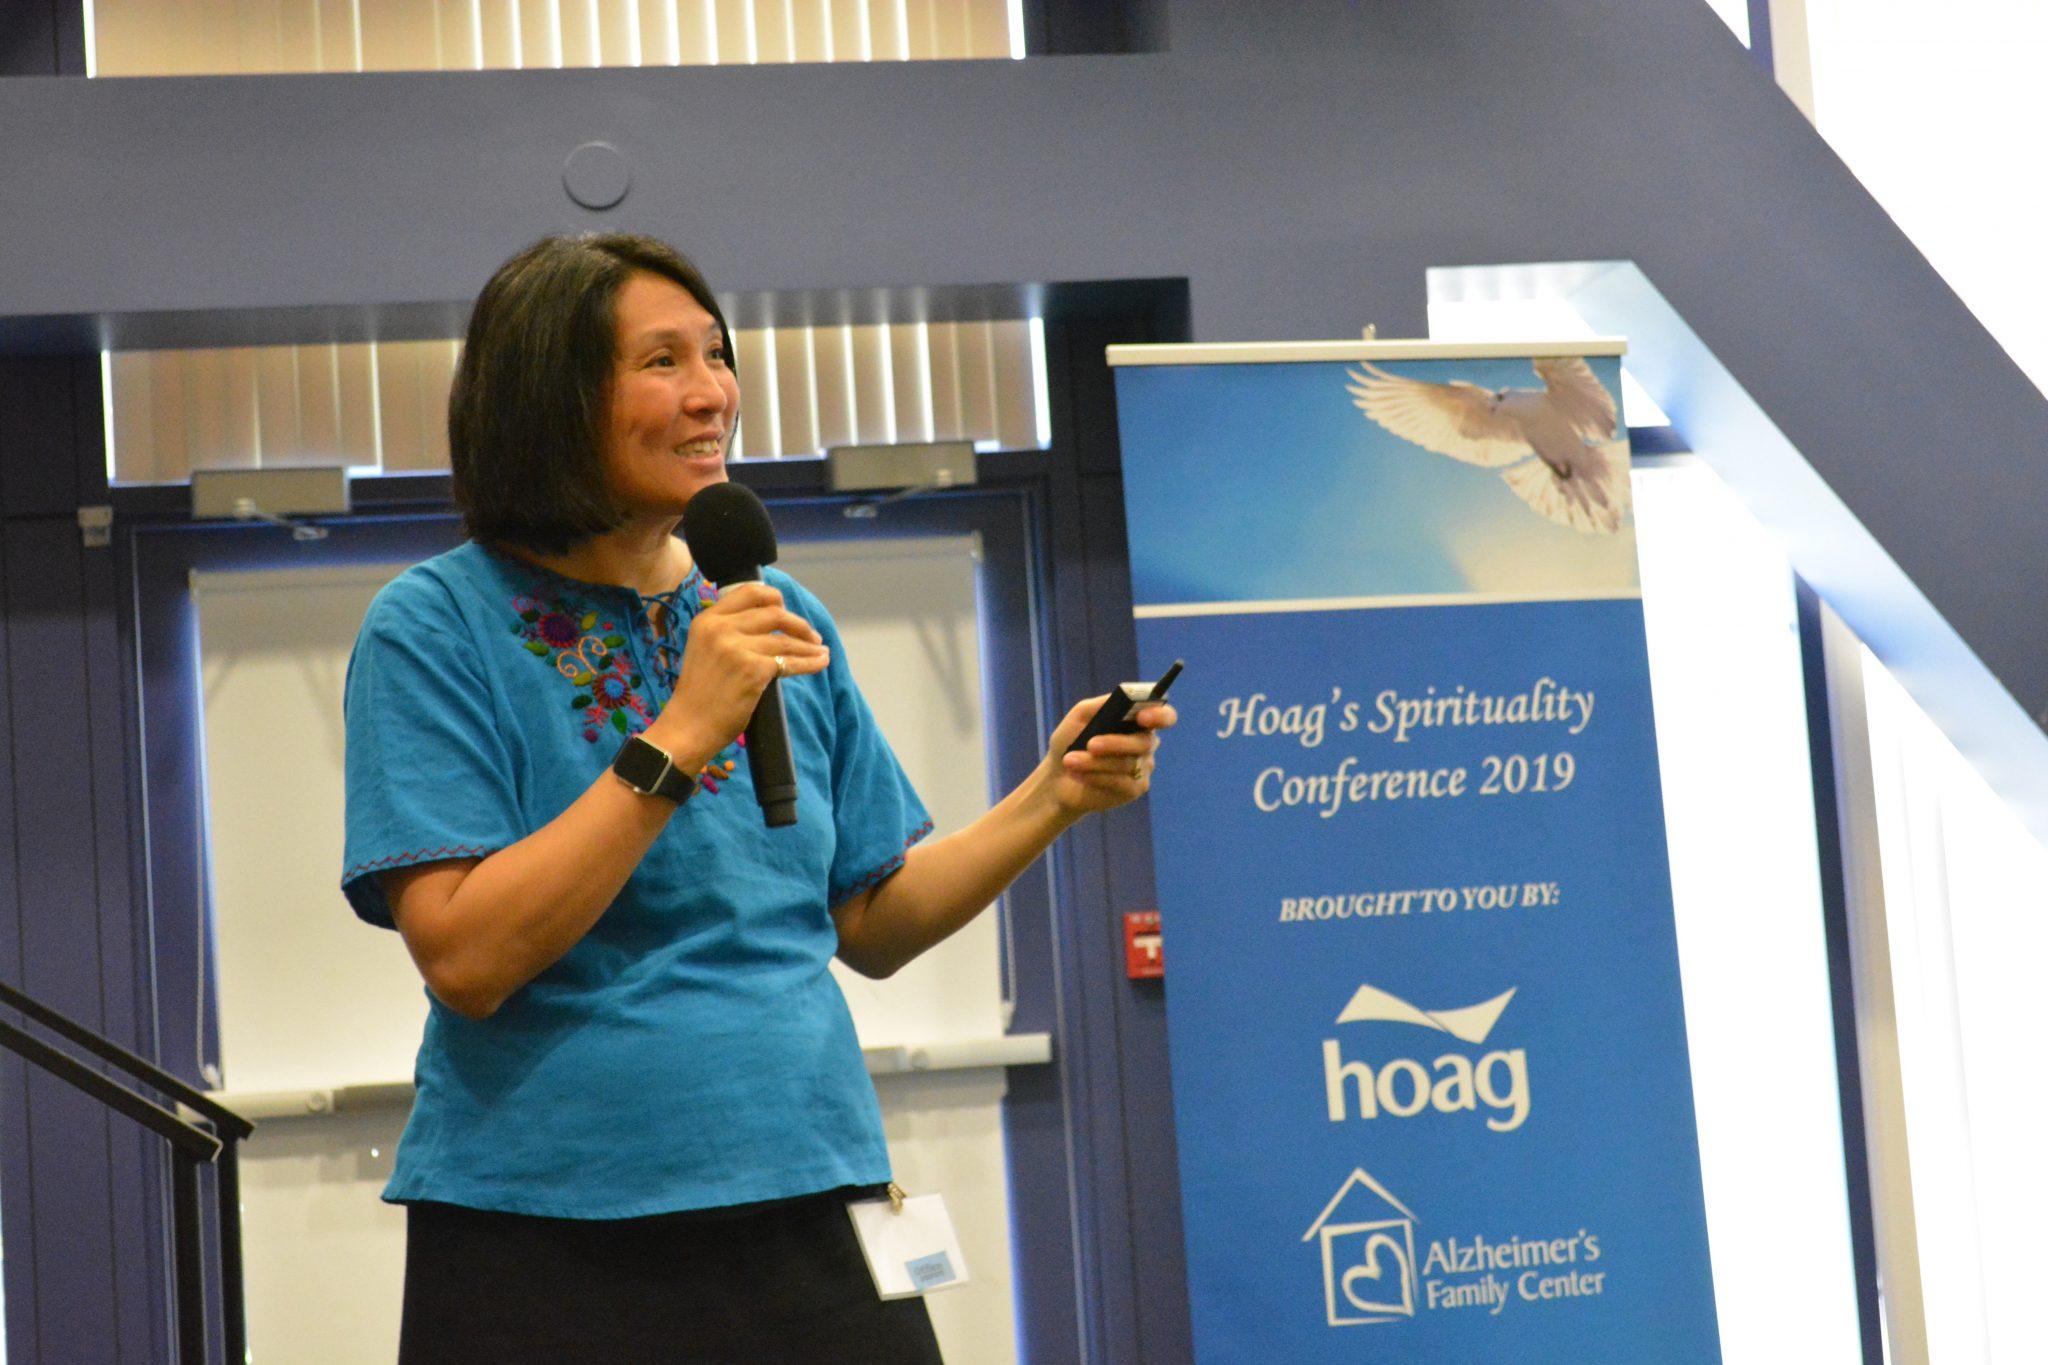 Hoag's 2019 Spirituality Conference